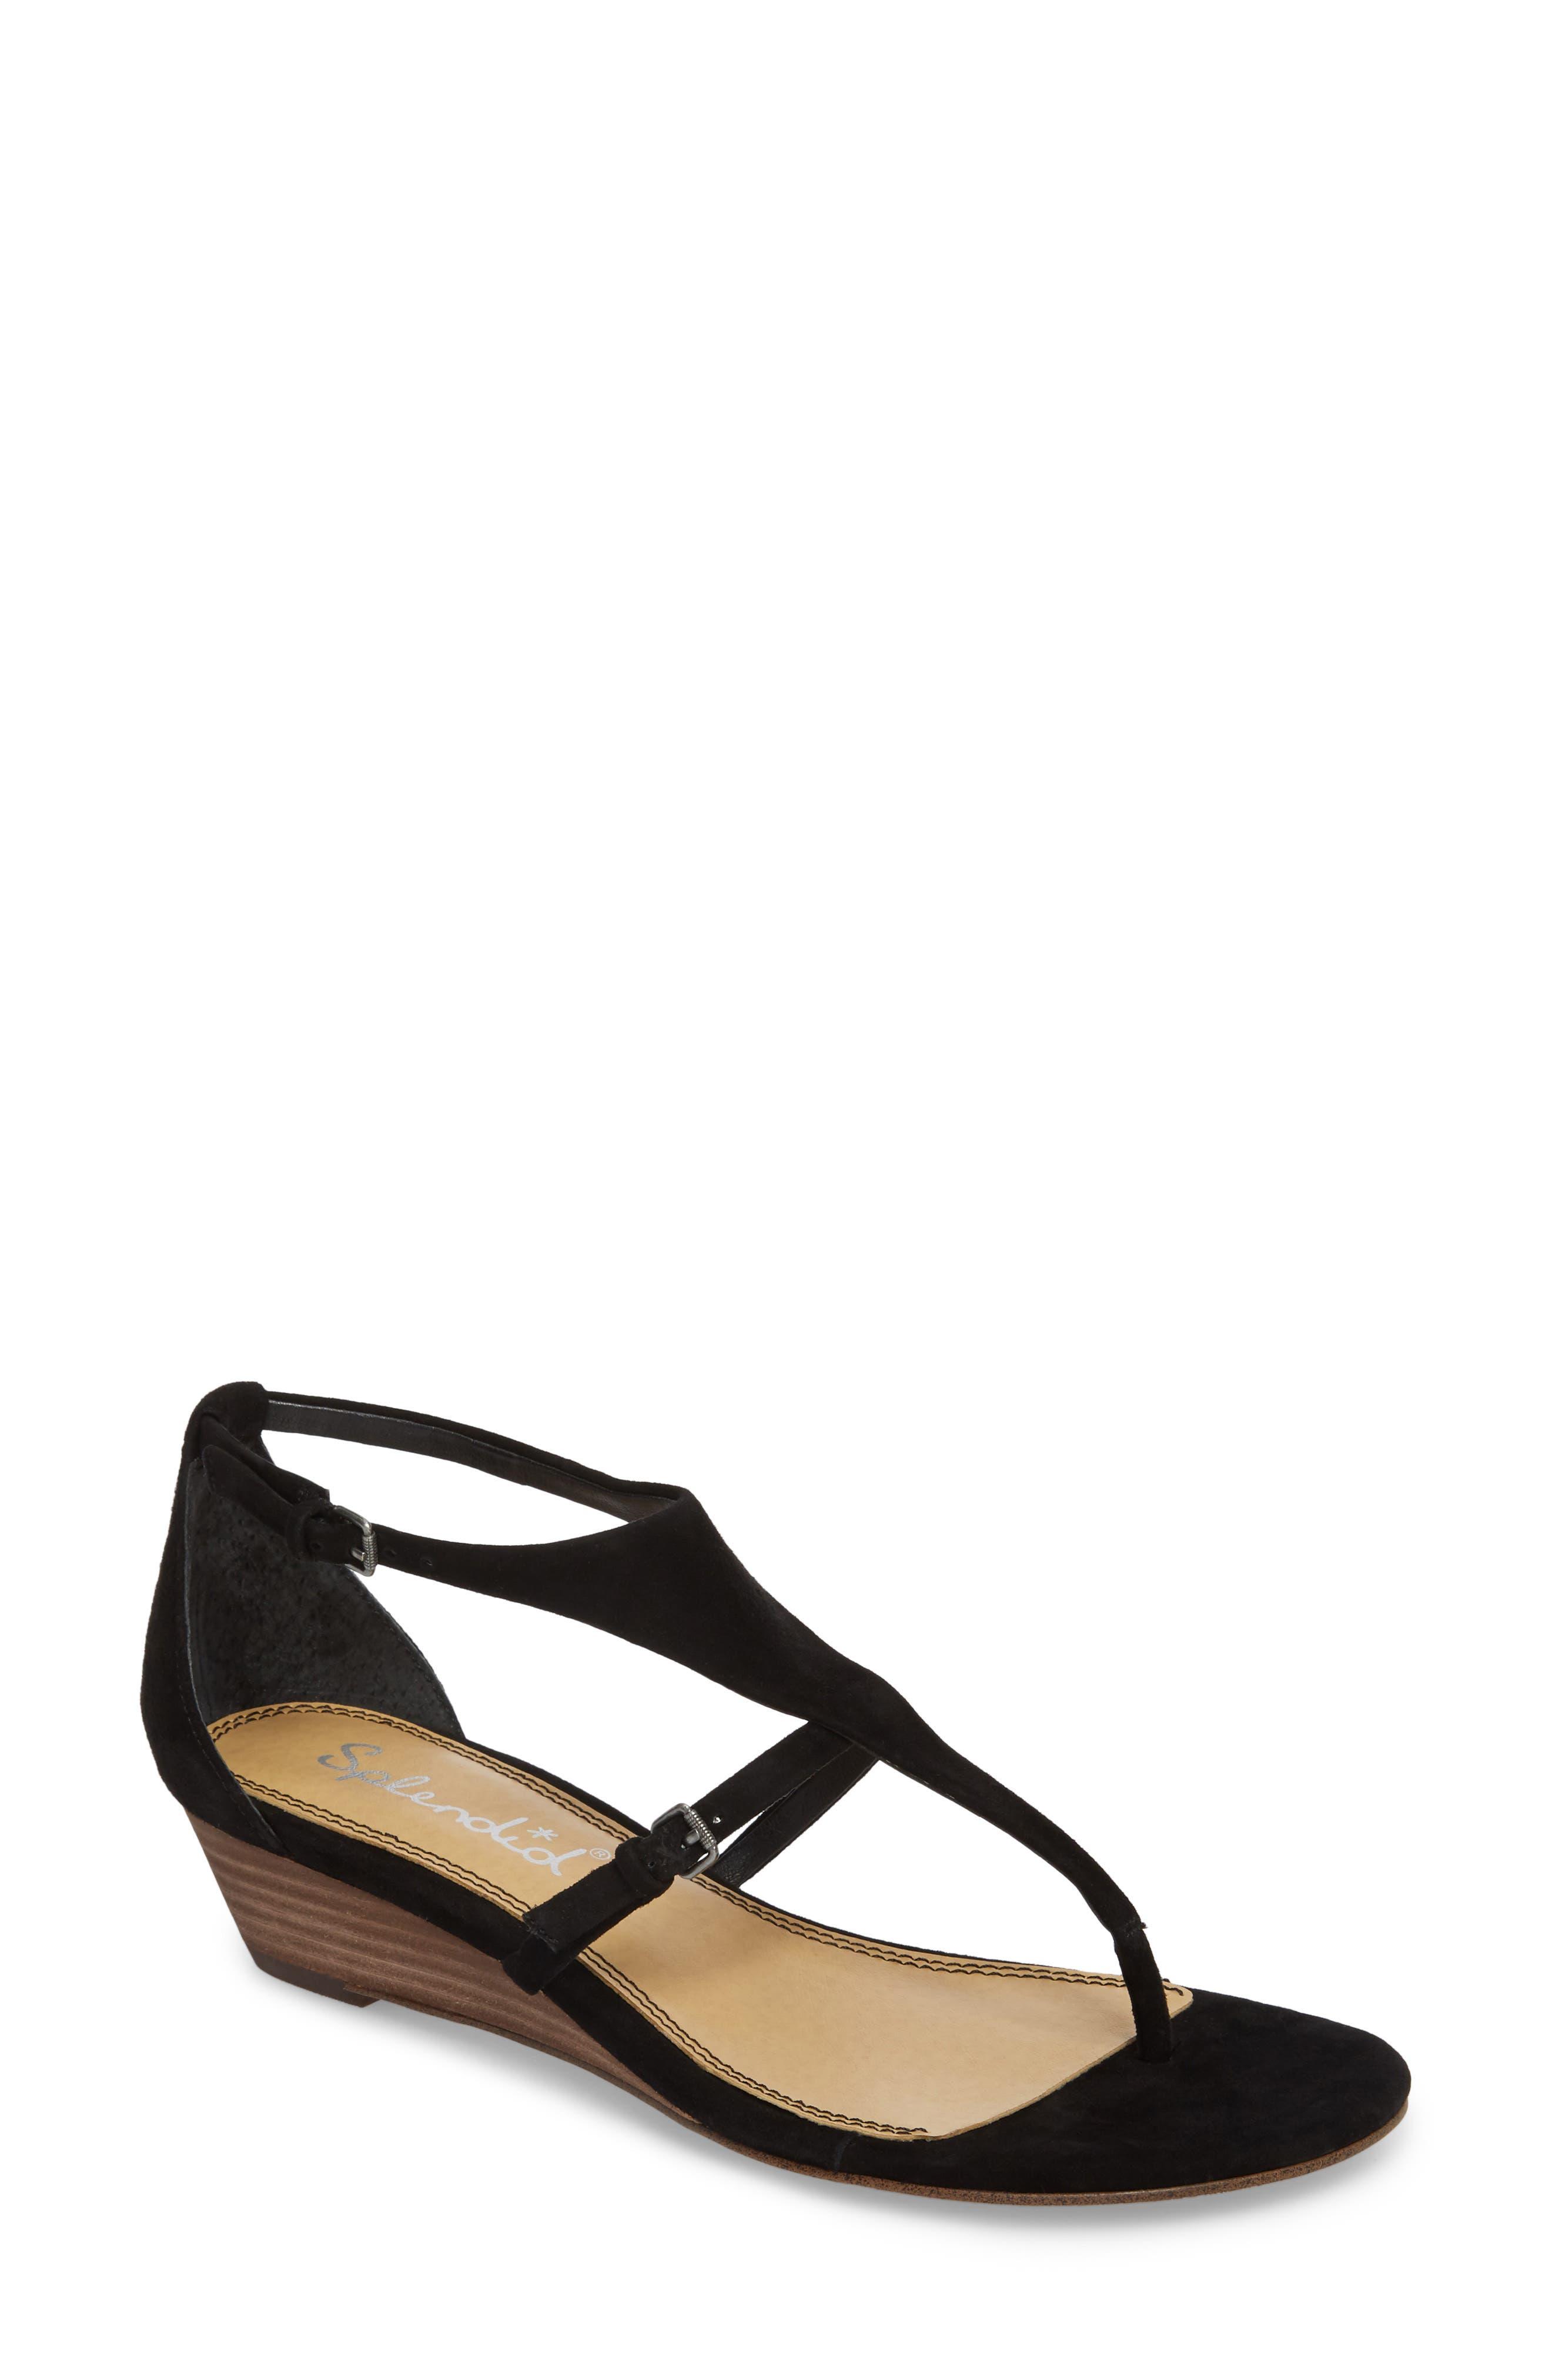 Main Image - Splendid Brooklyn V-Strap Wedge Sandal (Women)